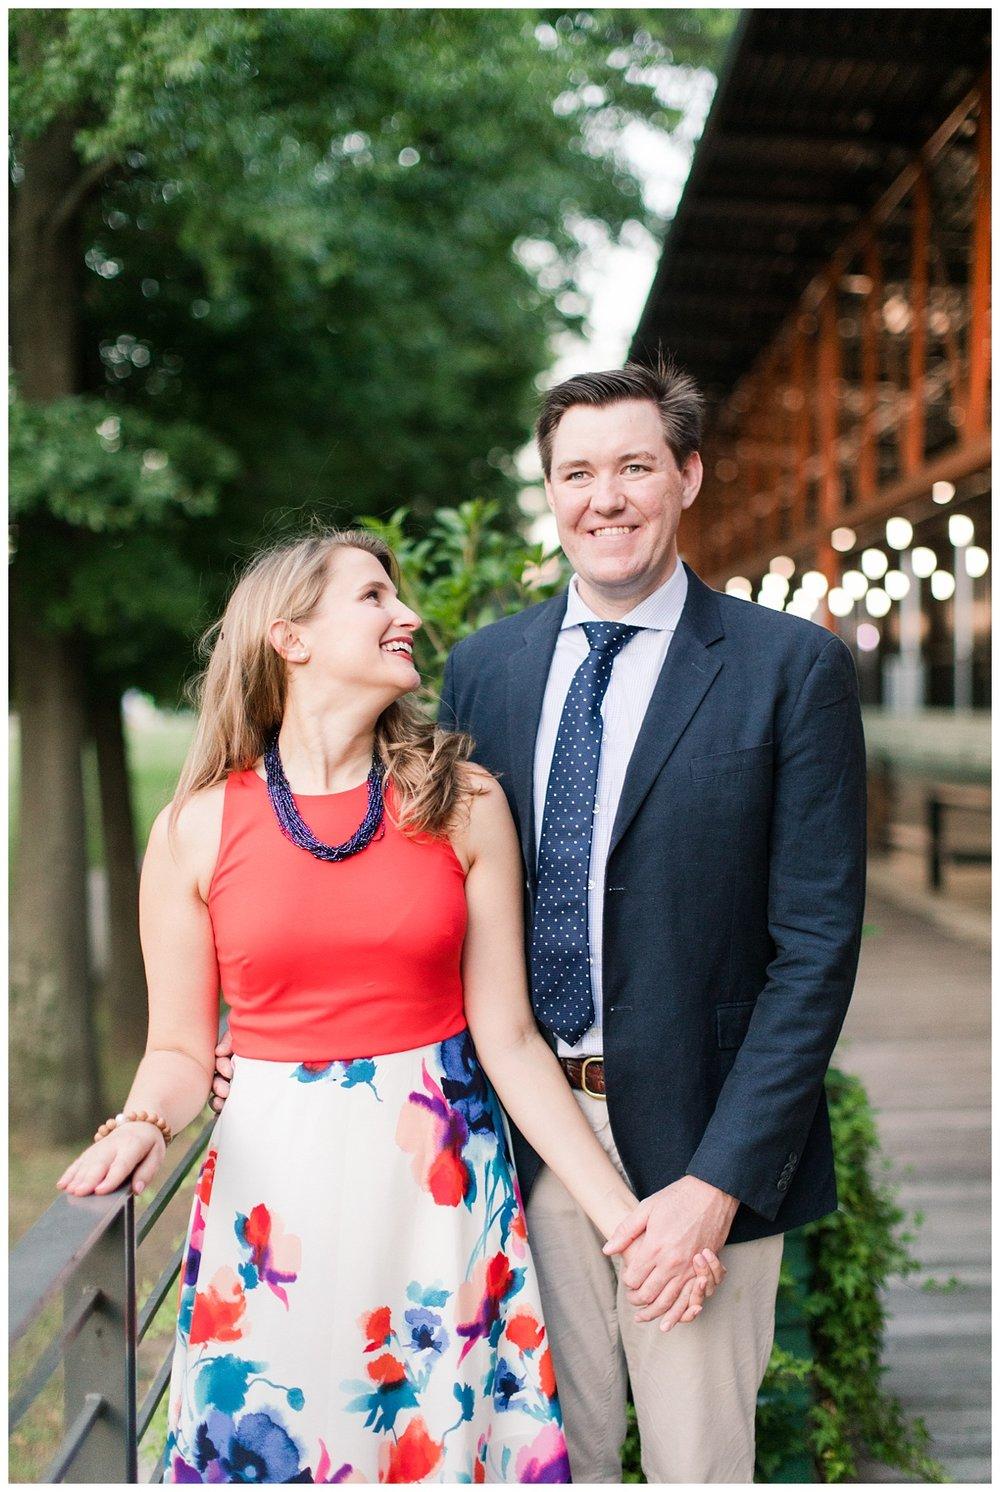 Engagement Pictures_KIm and Hamish_Abby Breaux Photography_Atlanta_Ponce City Market_Jackson Street Bridge_0064.jpg